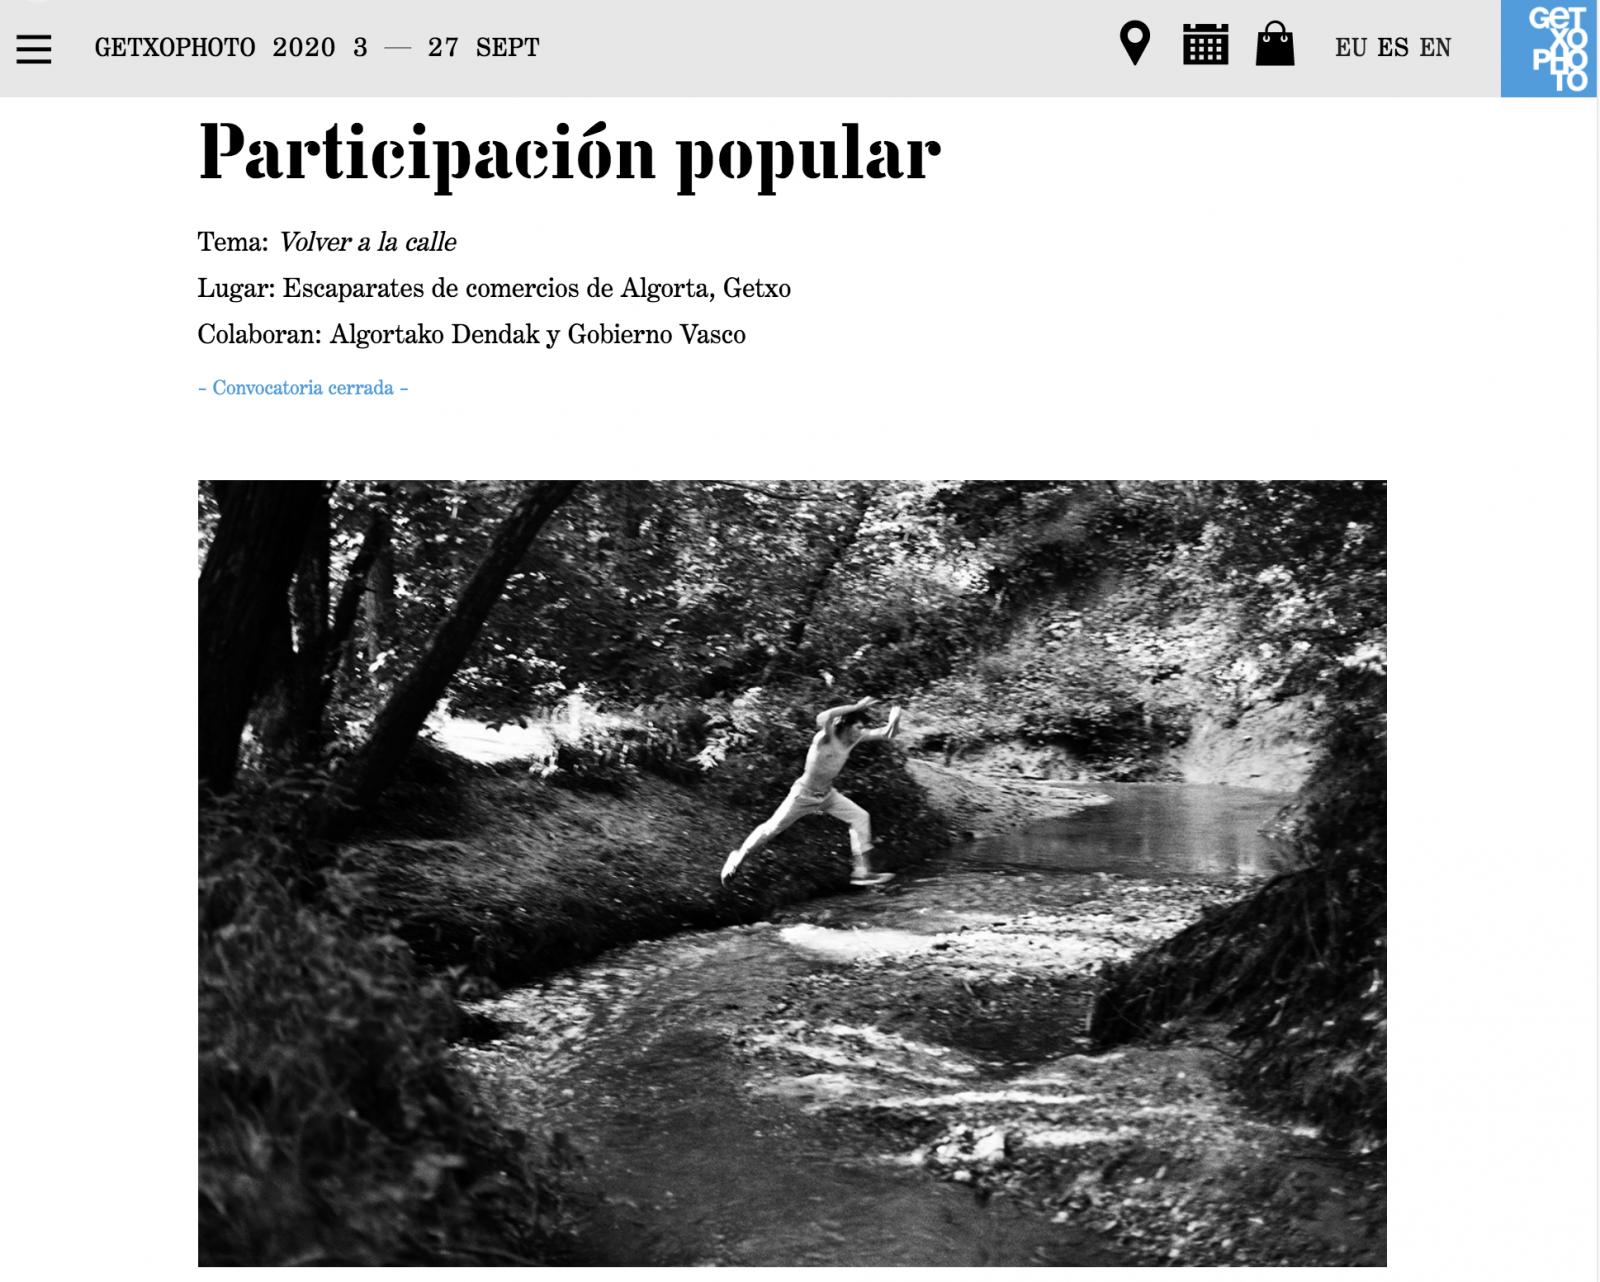 Photography image - Loading Captura_de_pantalla_2020-09-01_a_la(s)_16.04.22.png